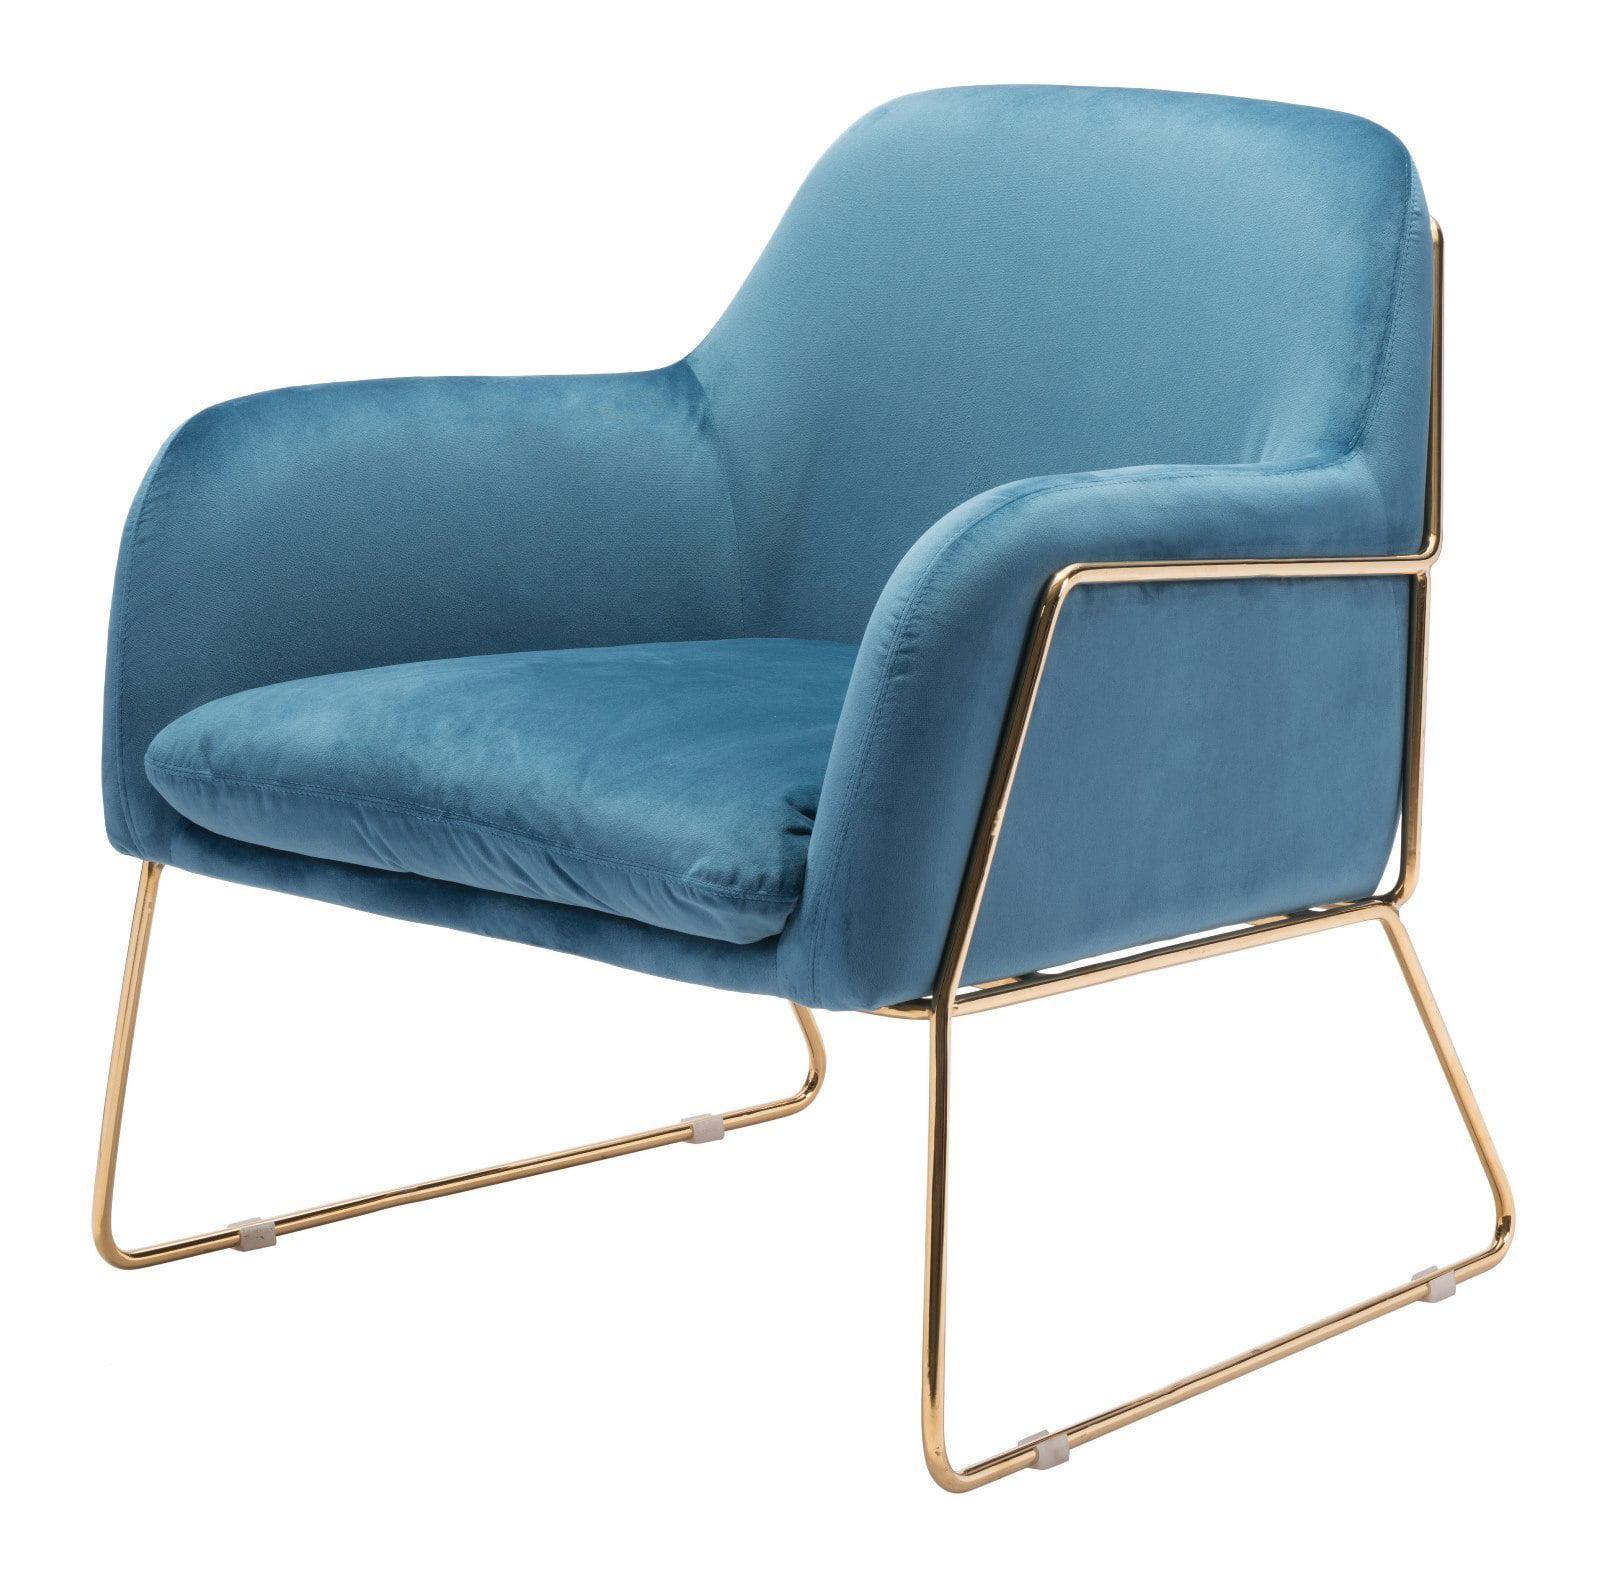 Modern contemporary armchair accent chair blue velvet fabric chromed steel walmart com